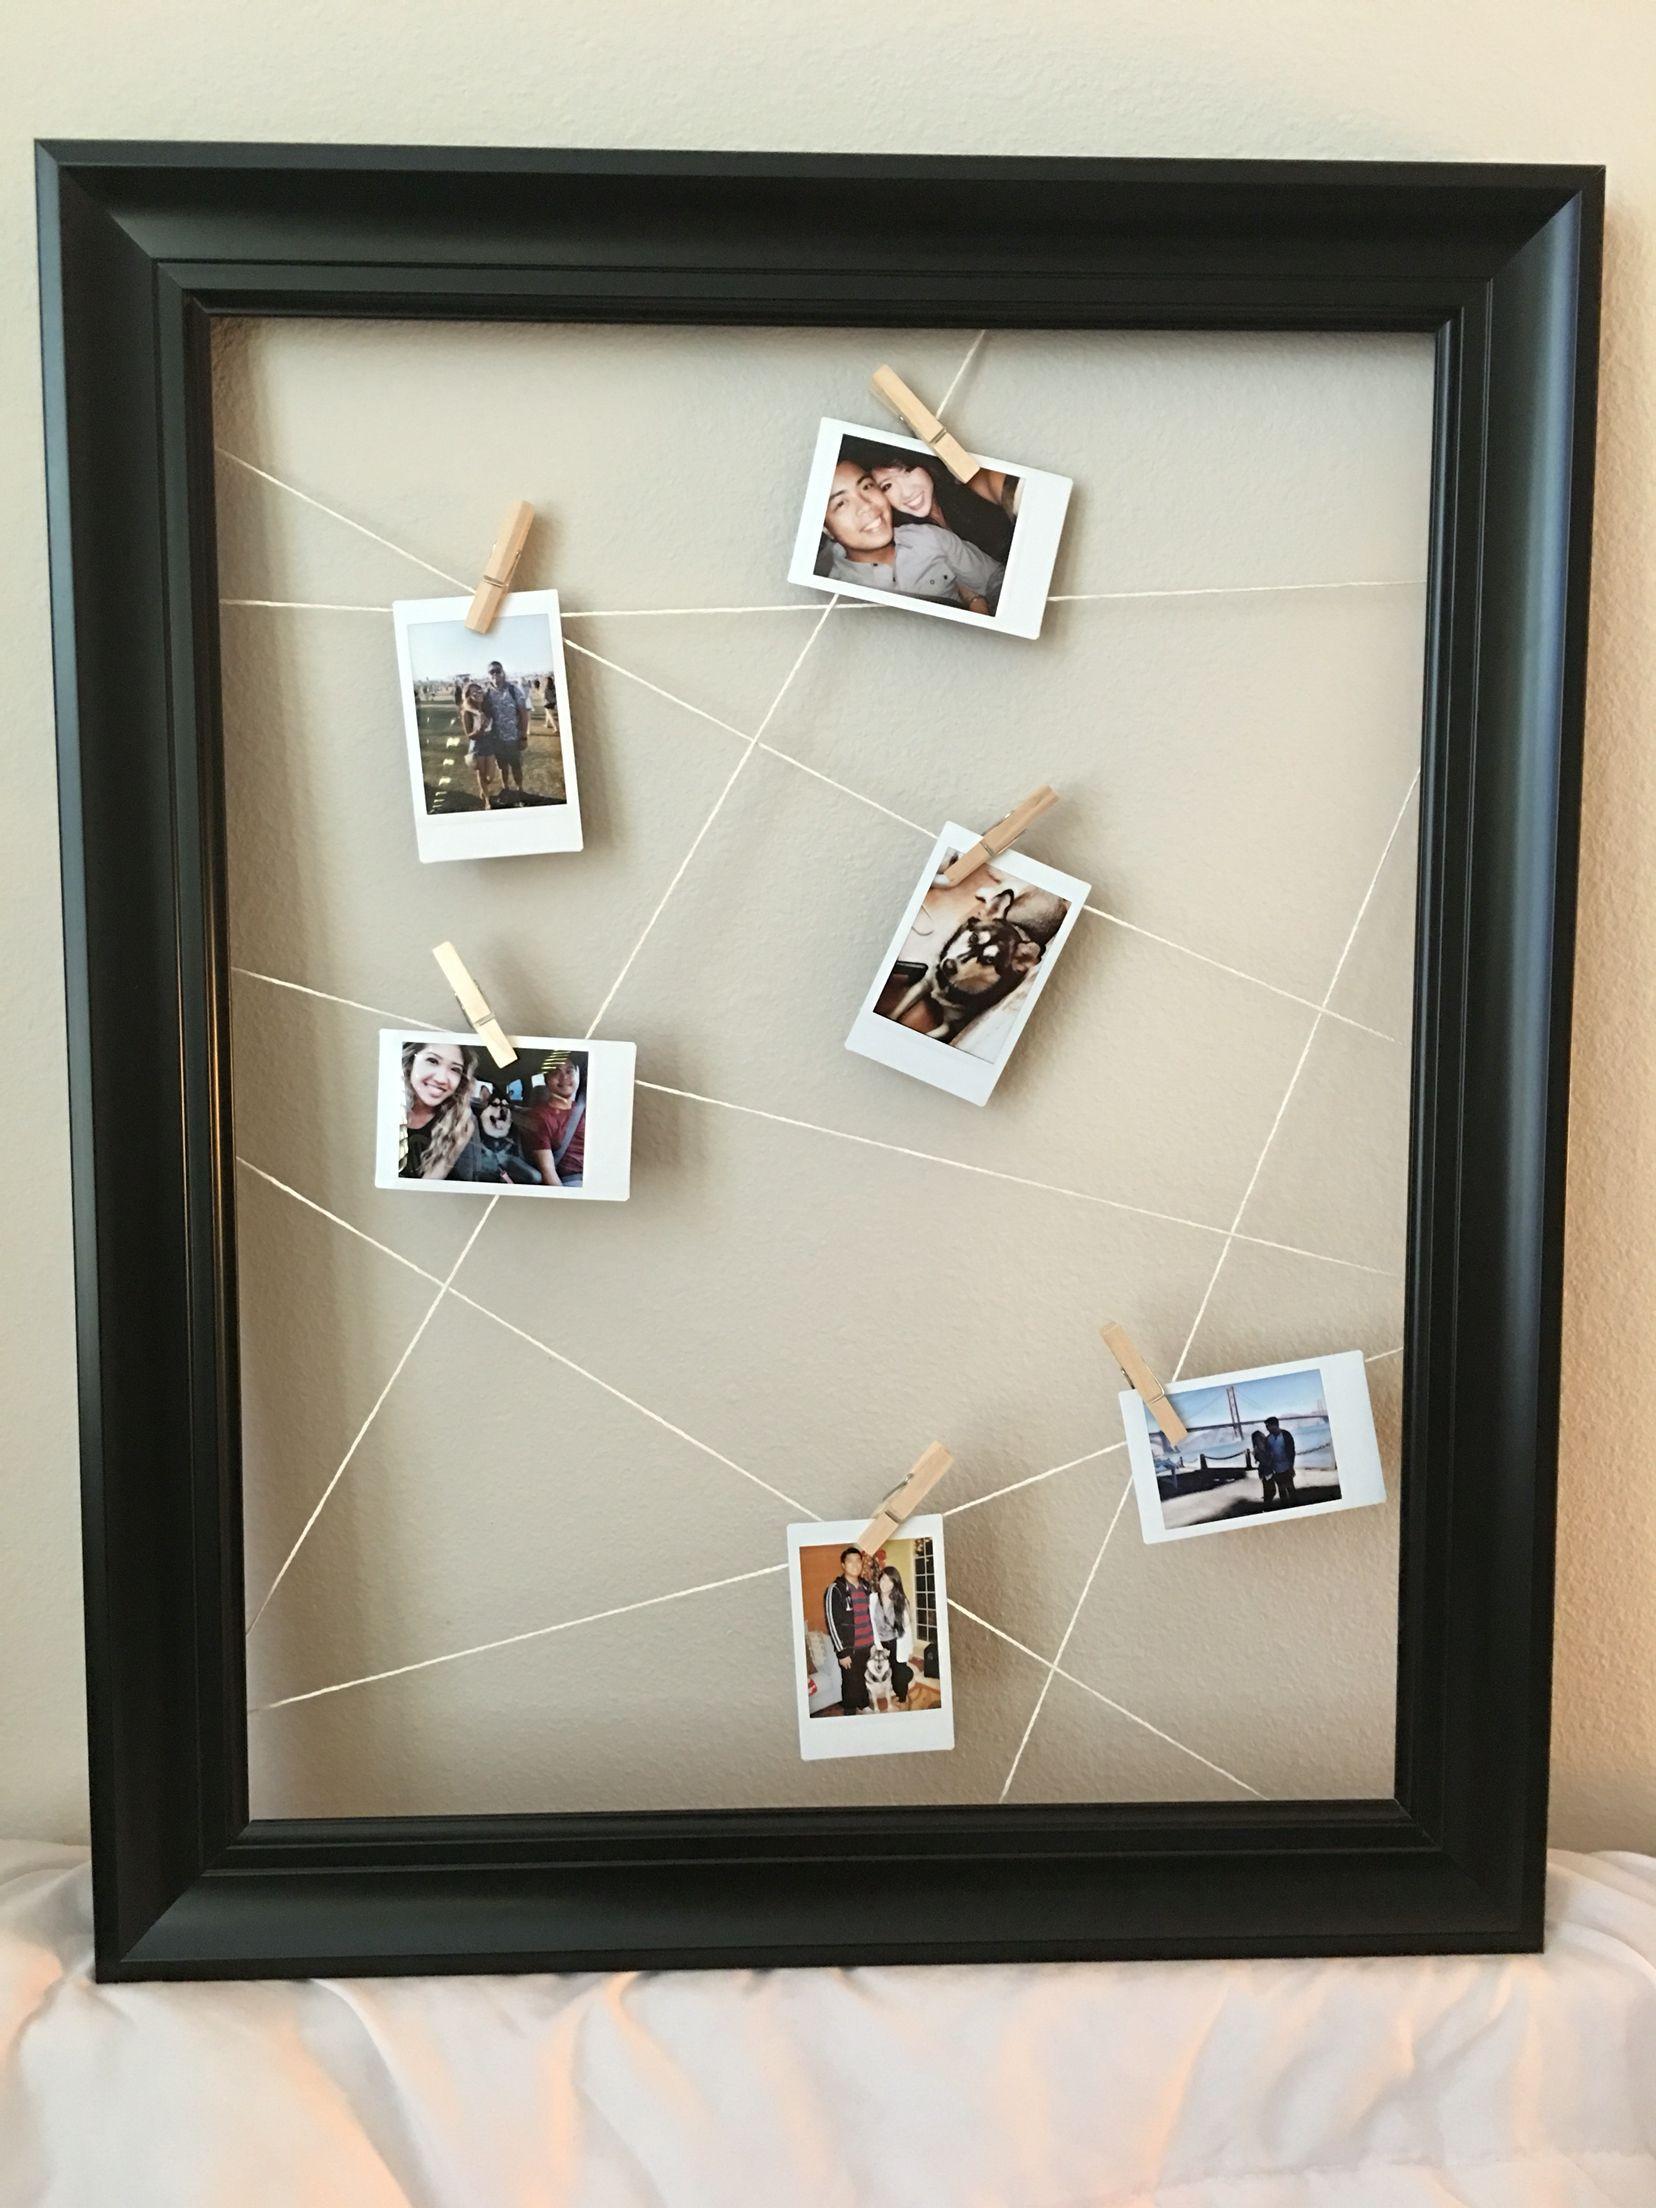 DIY Polaroid Frame | DIY for Him | Pinterest | Polaroid frame